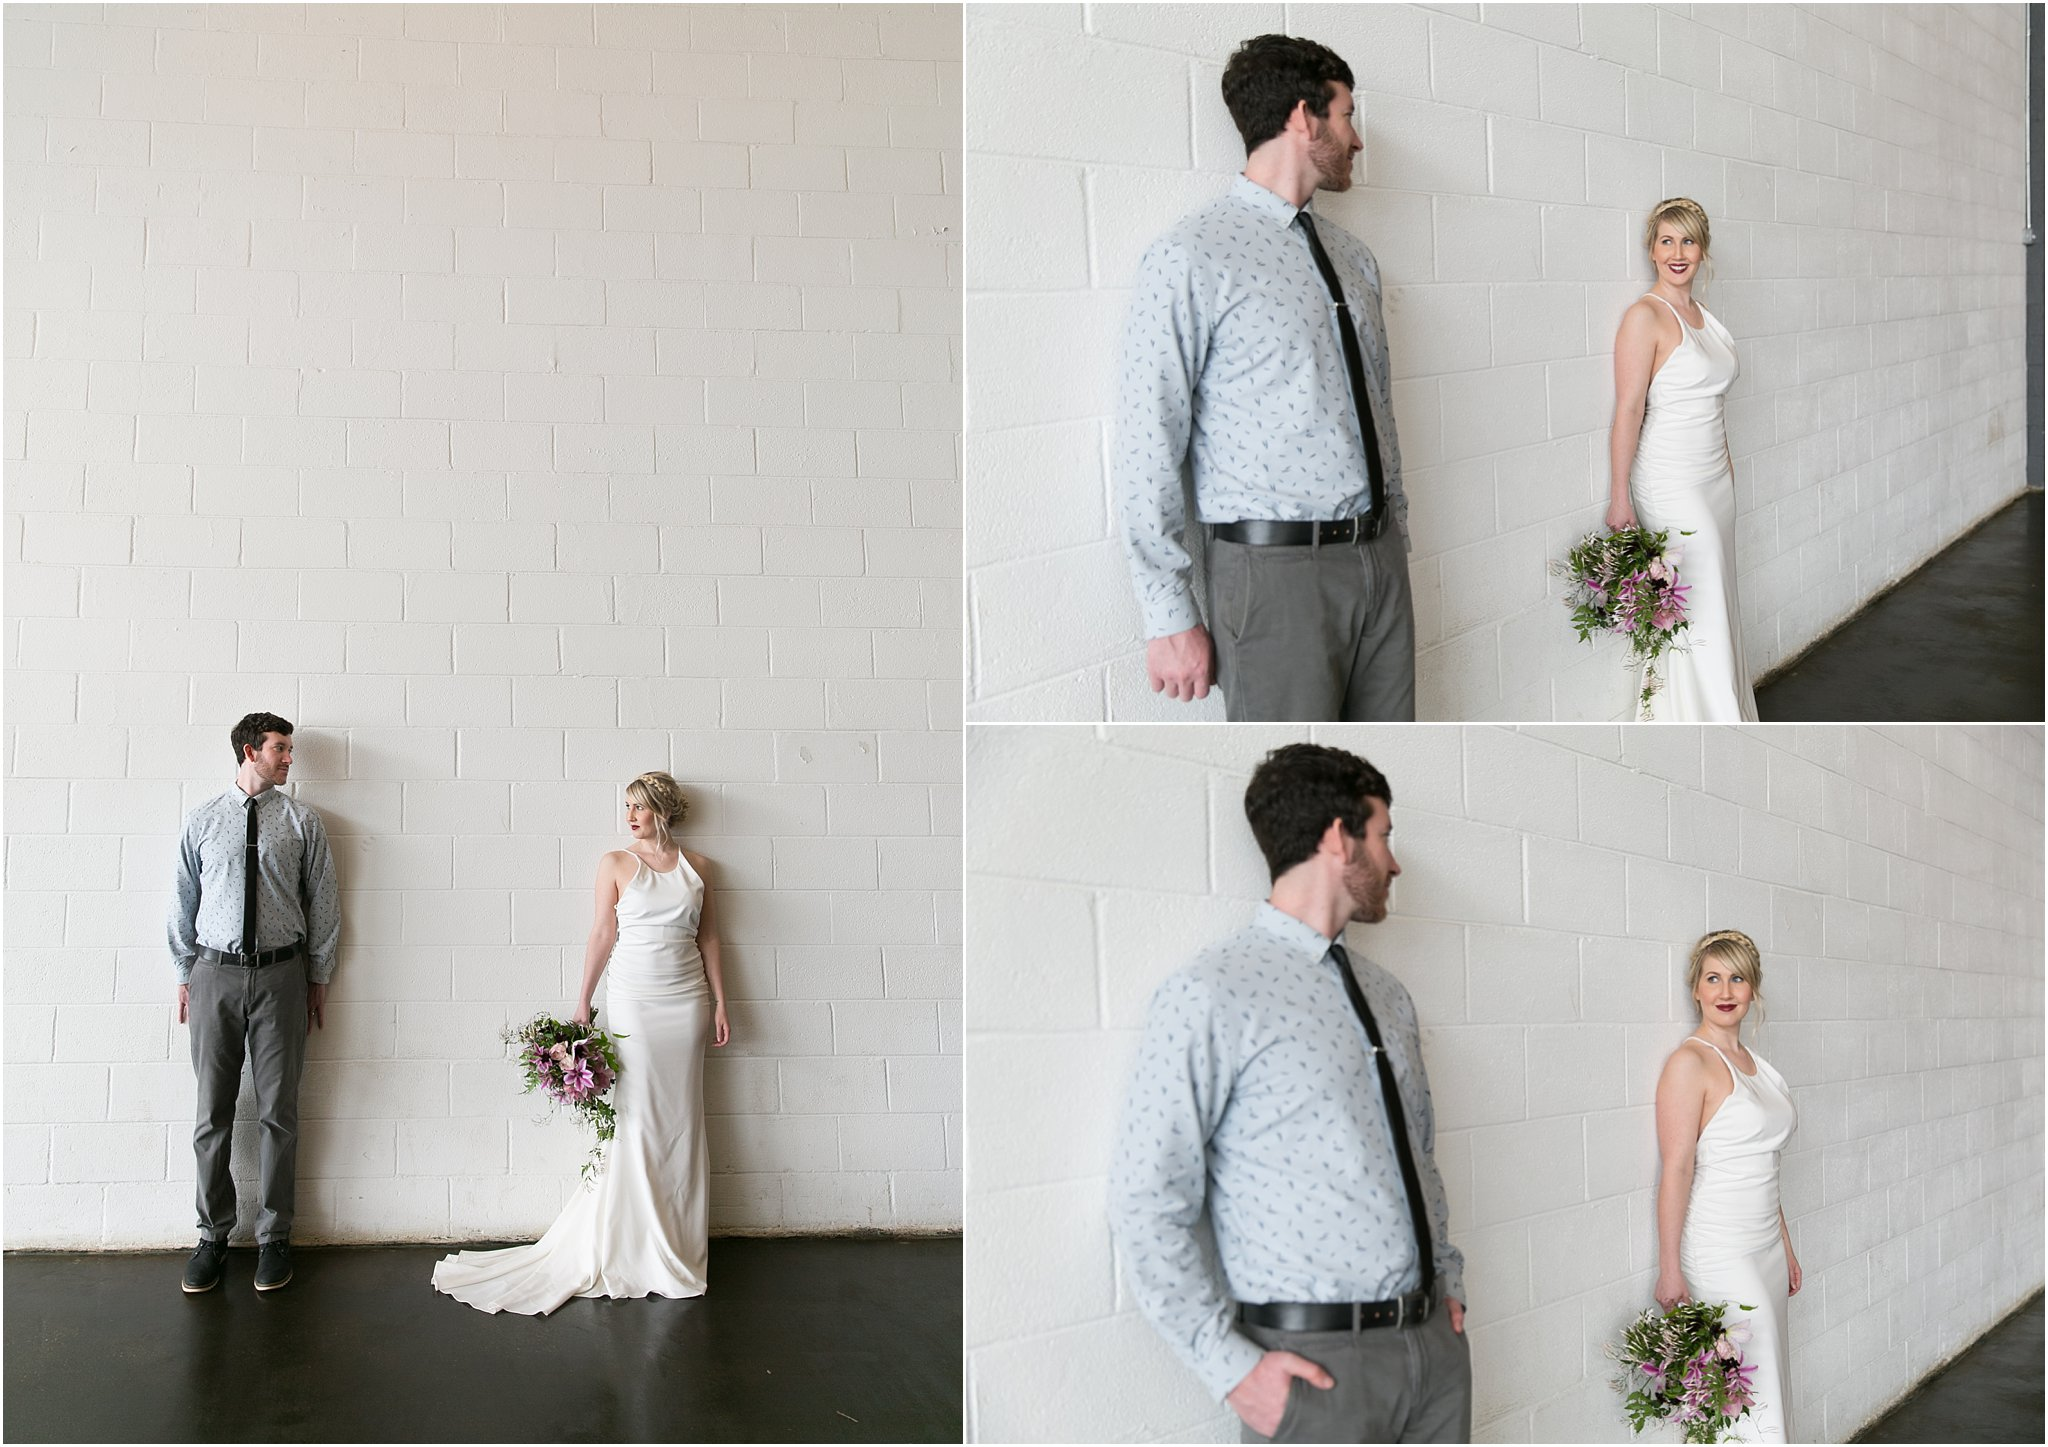 jessica_ryan_photography_oconnor_brewing_wedding_oconnor_brewing_co_norfolk_virginia_roost_flowers_blue_birds_garage__0796